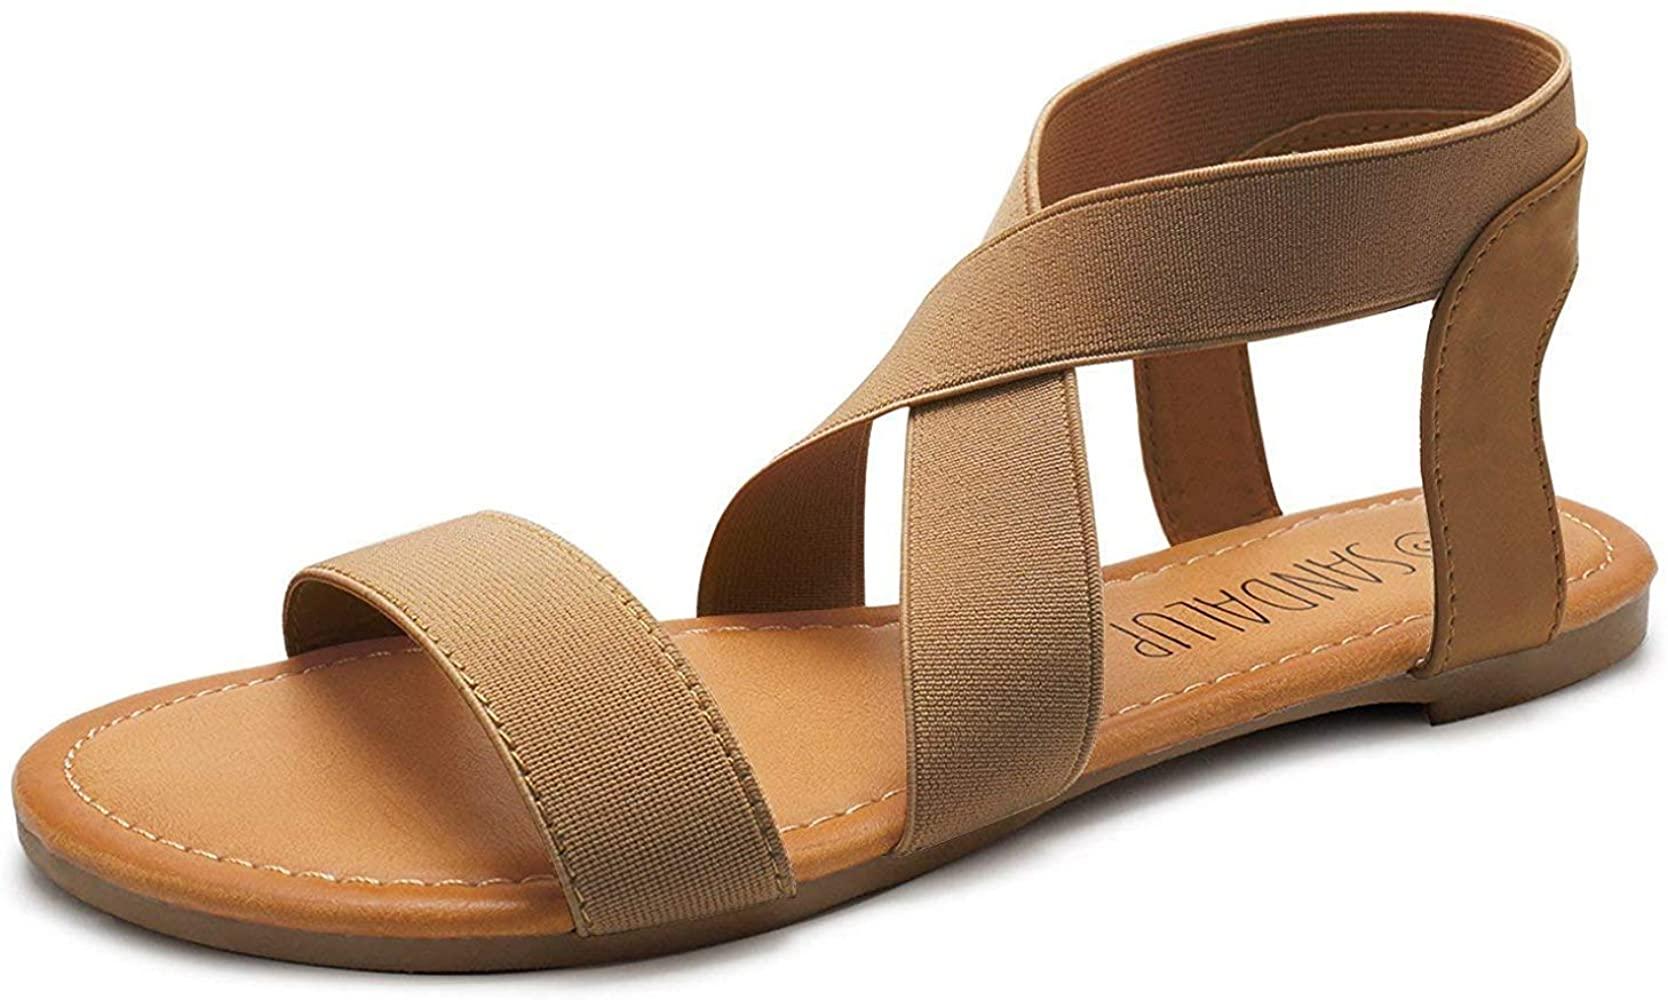 Hamza Footwear - Ladies flat sandal